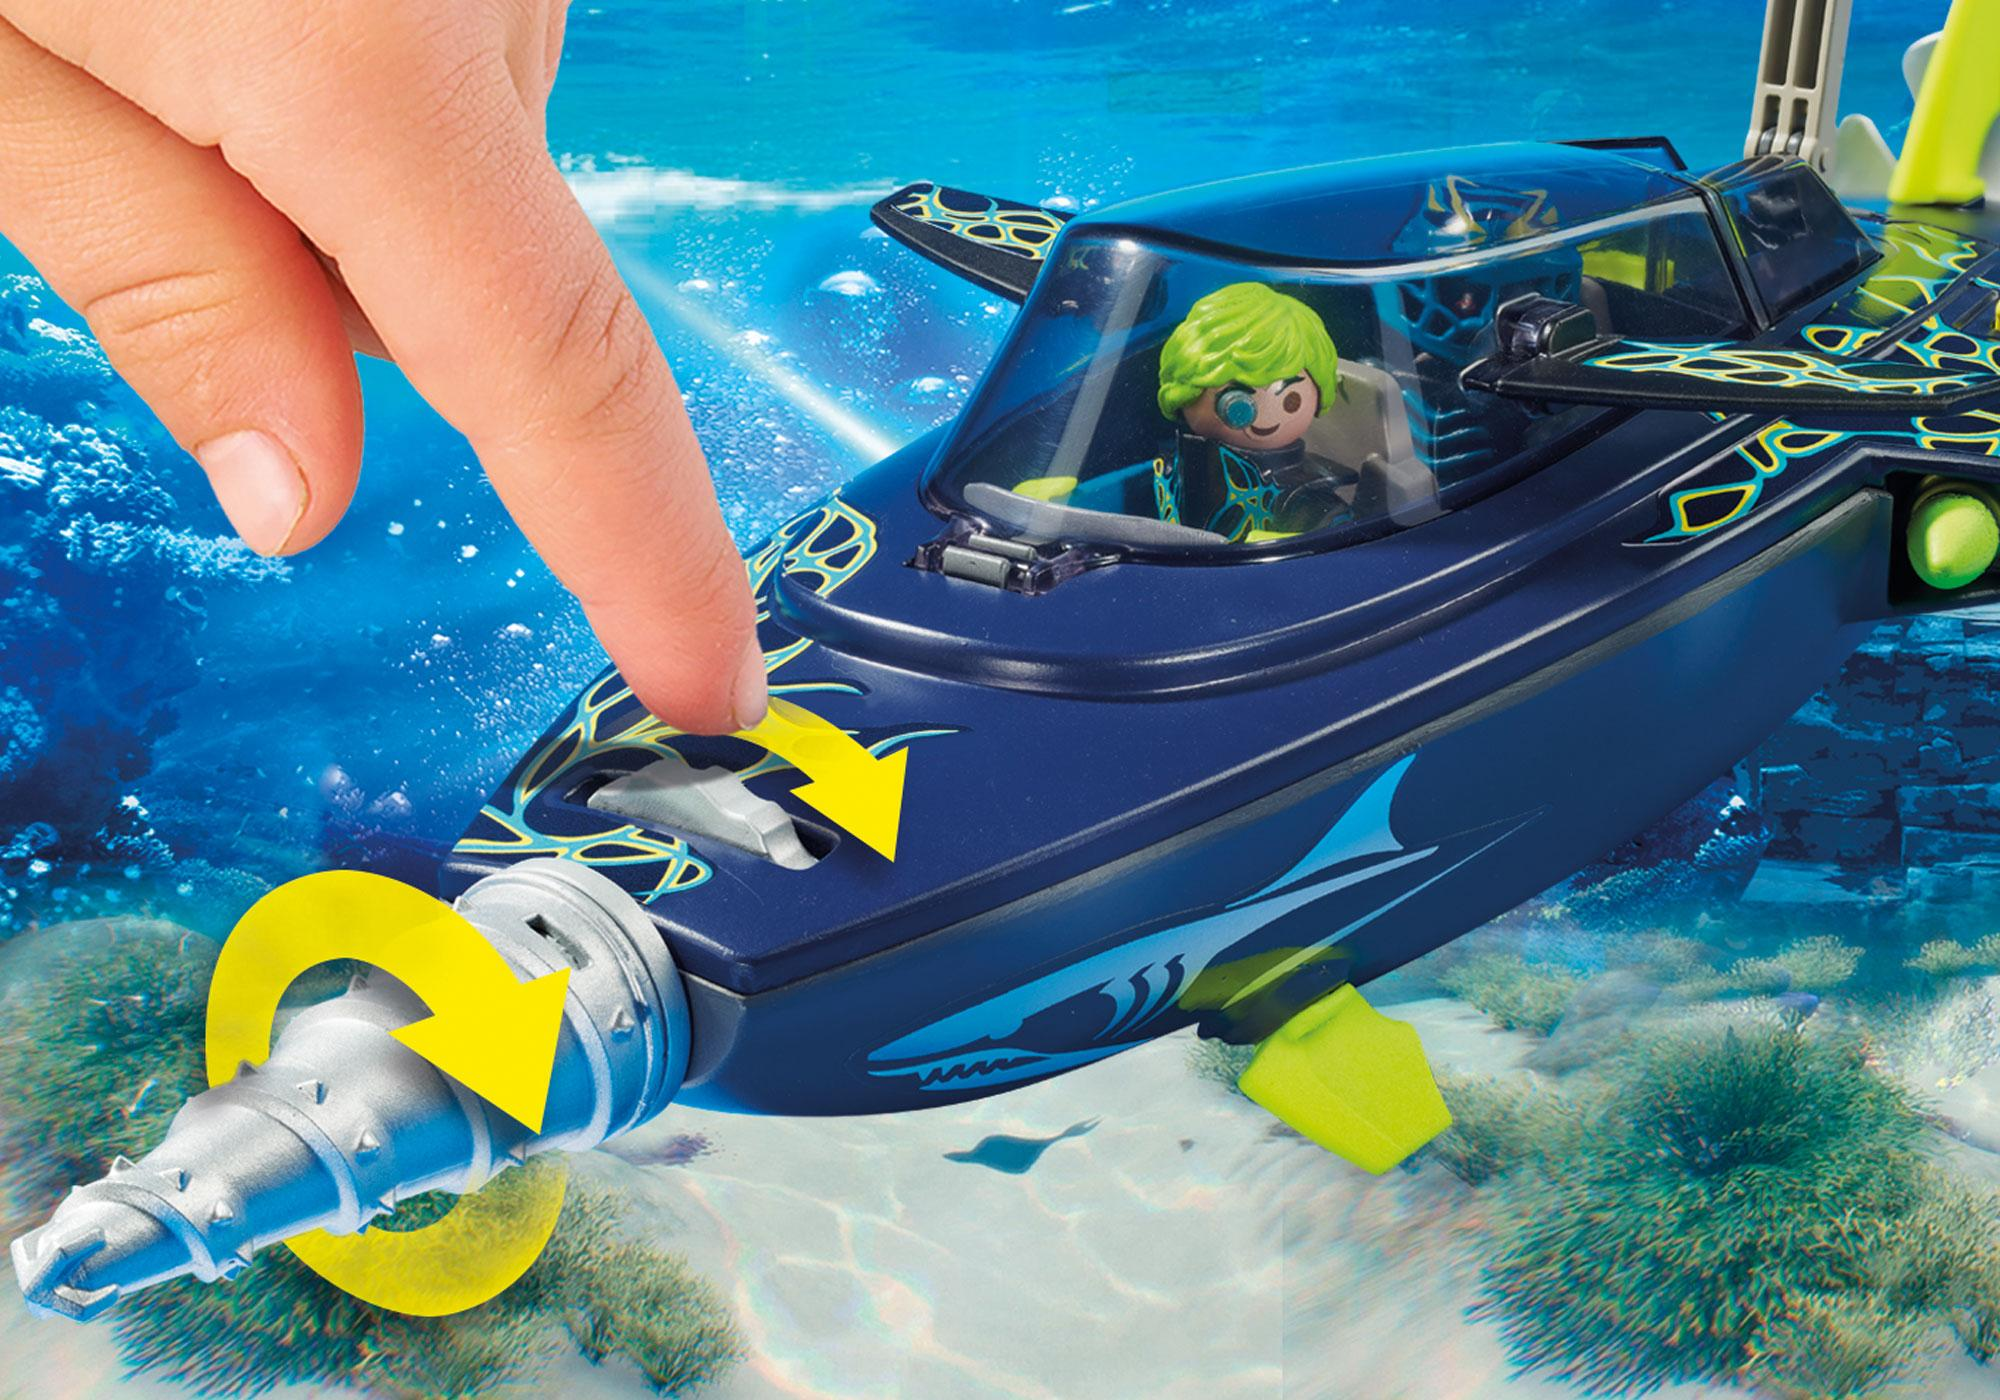 http://media.playmobil.com/i/playmobil/70005_product_extra4/TEAM S.H.A.R.K. Destroyer med bor